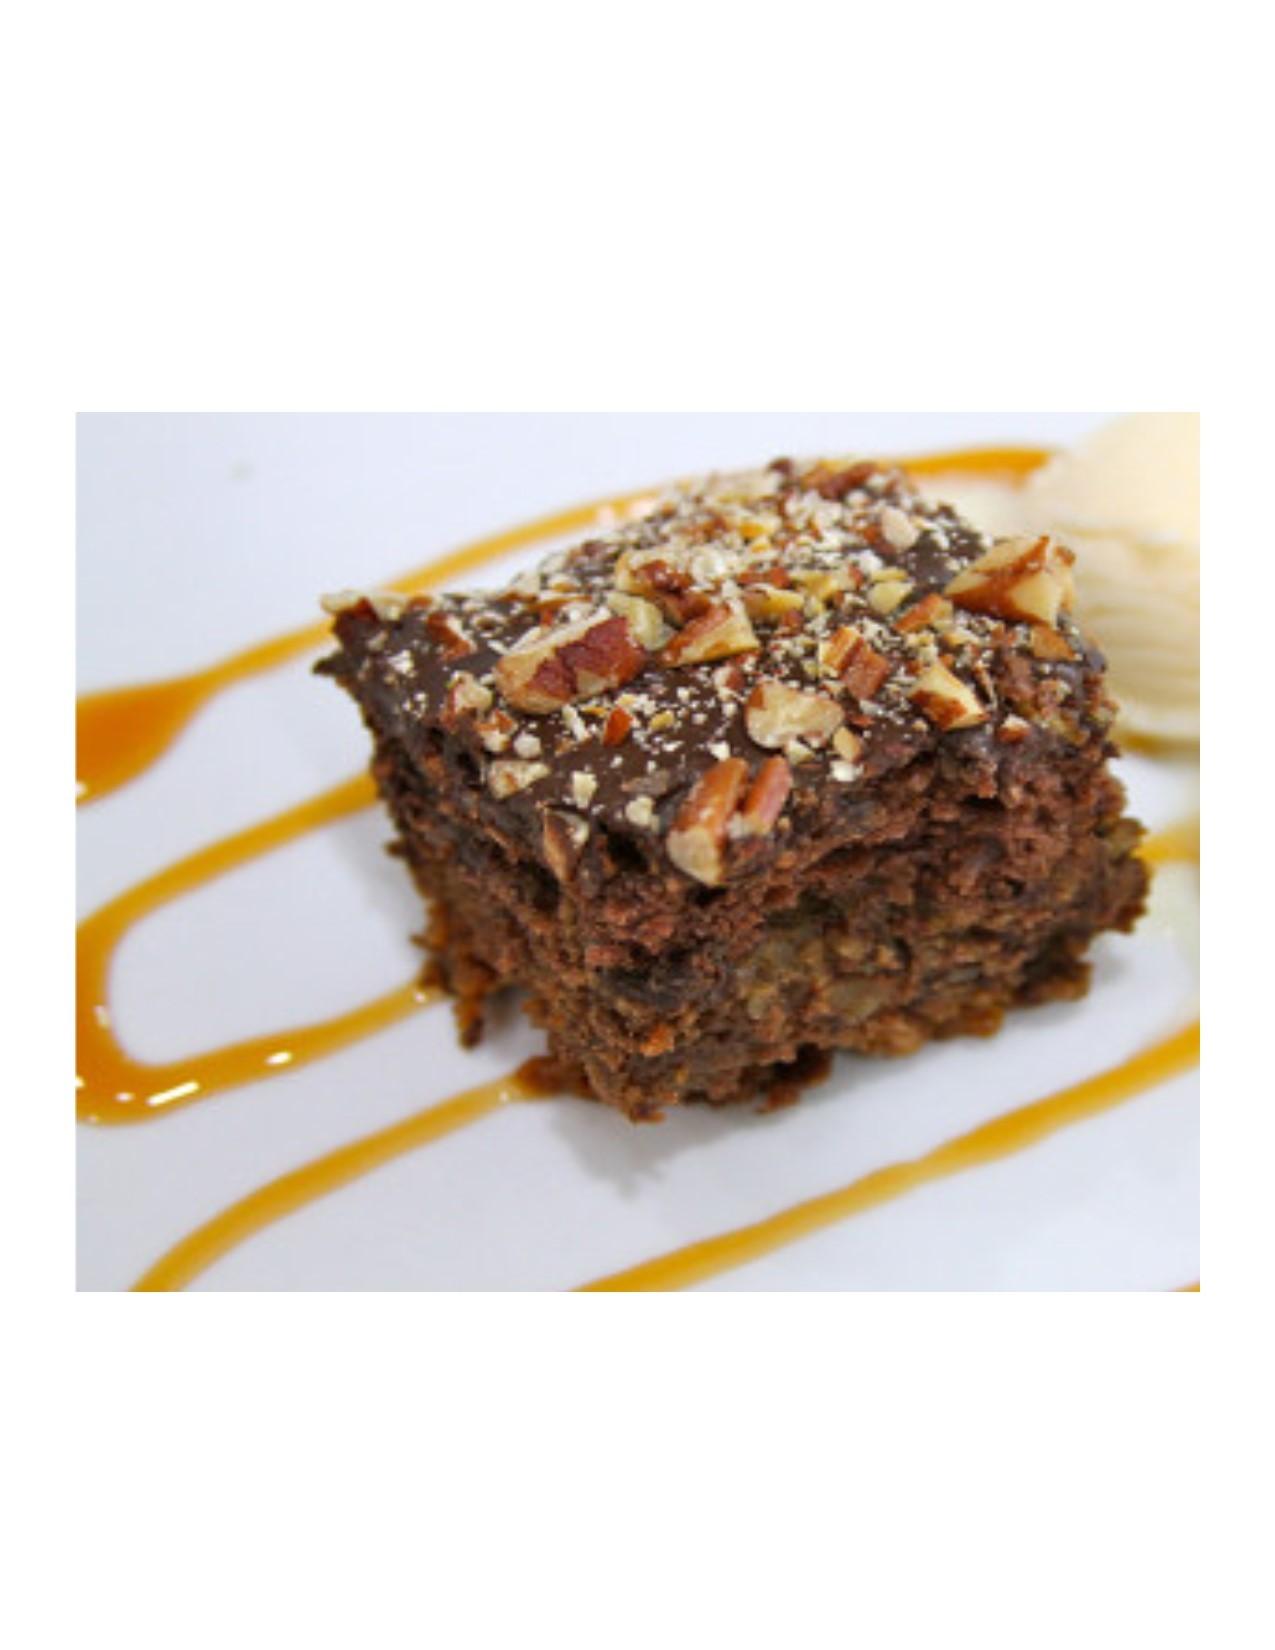 Honey Bun Chocolate Turtle Cake-Large